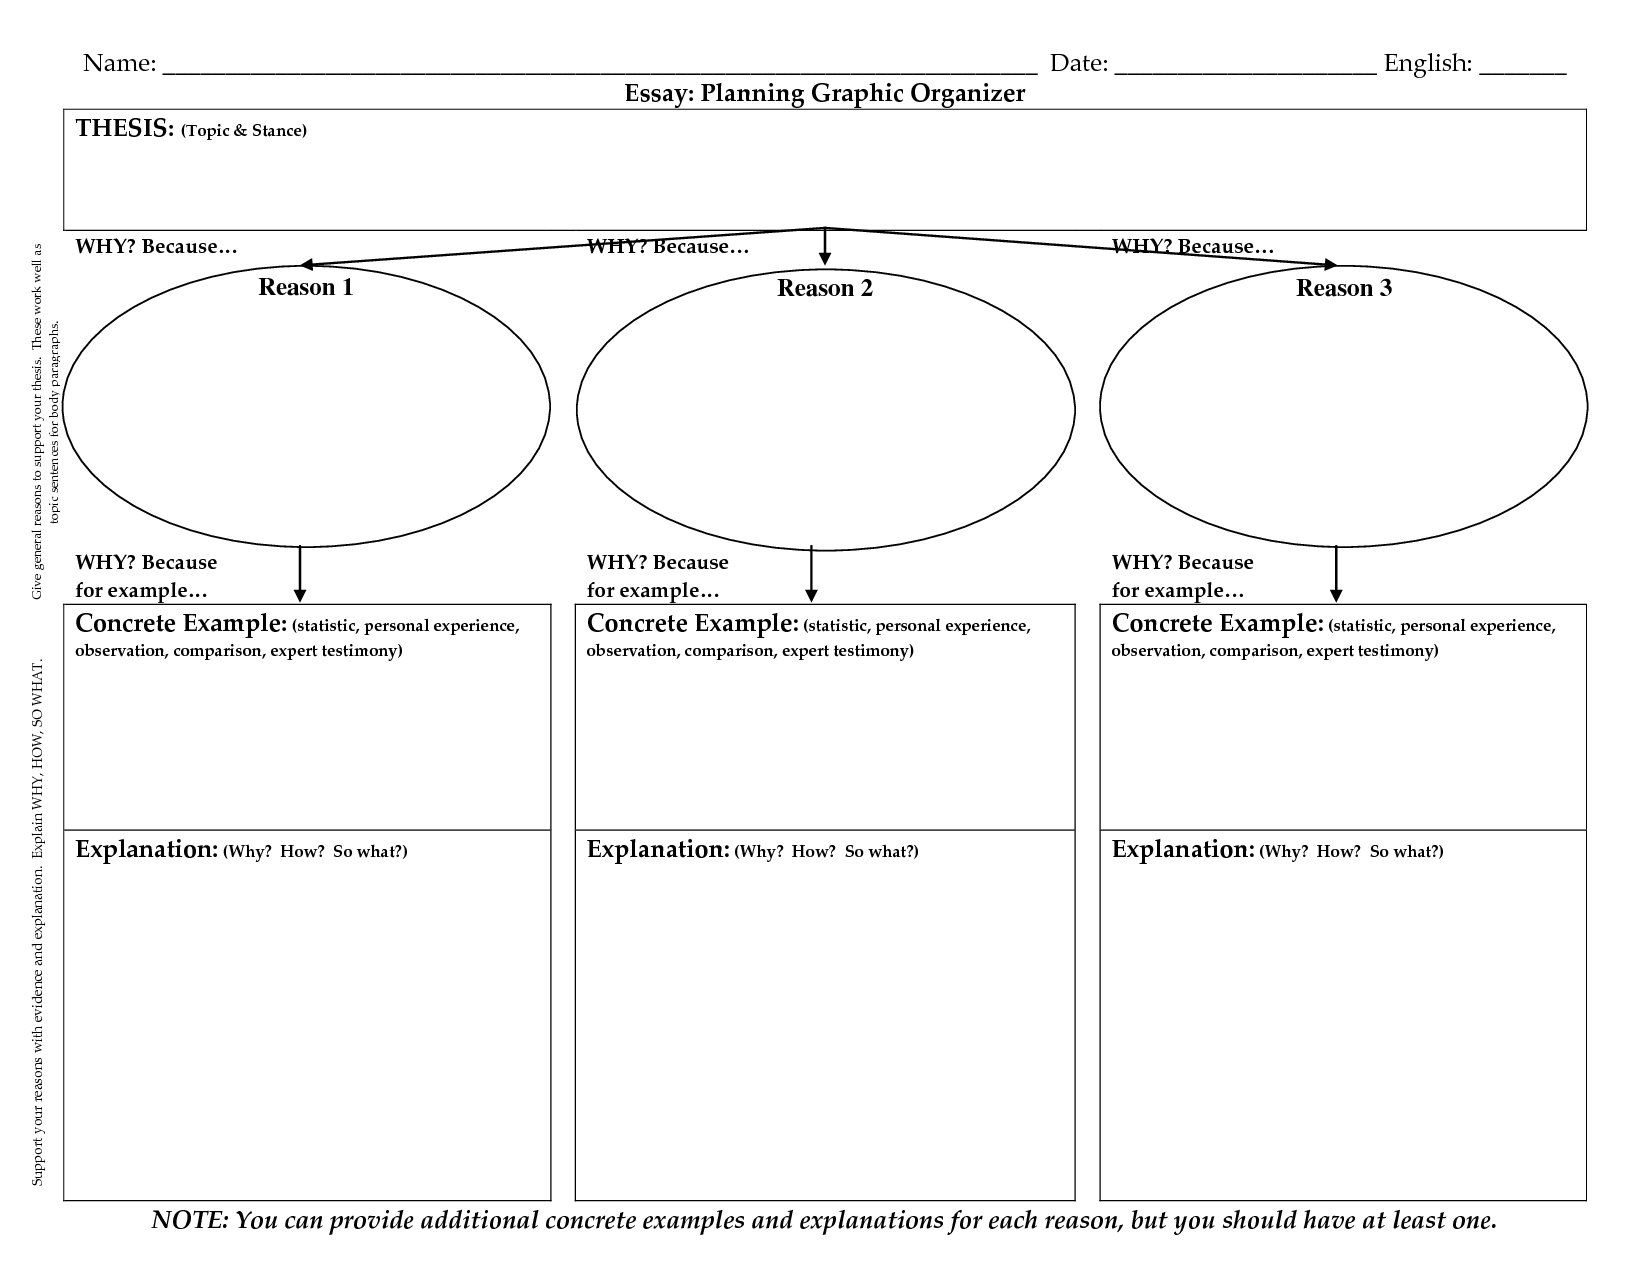 022 Persuasive Essay Graphic Organizer Example Amazing Argumentative Middle School Pdf Writing 5th Grade Answers Full